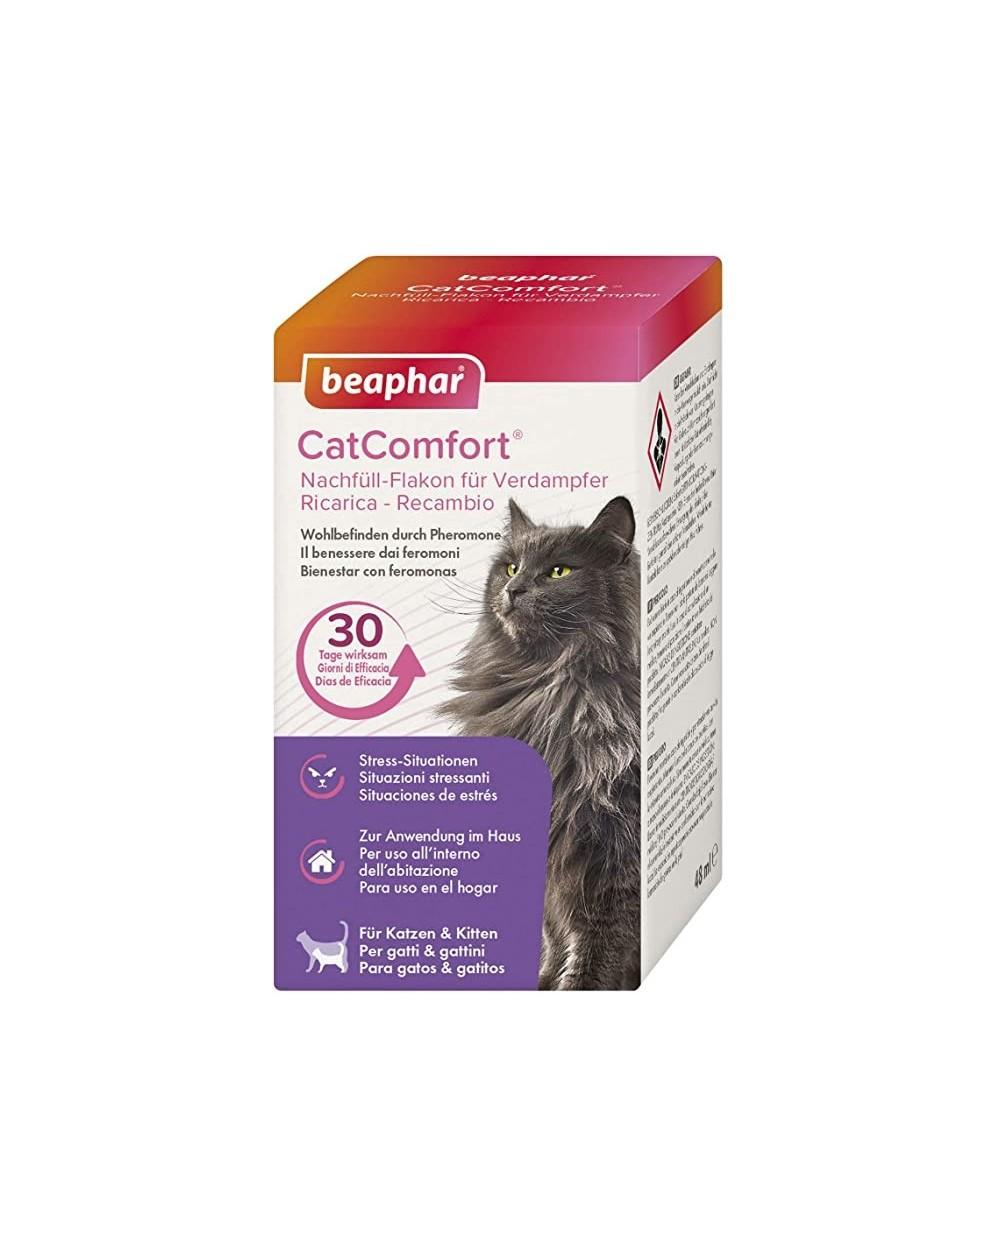 Beaphar Cat Comfort Calming Ricarica 48 ml